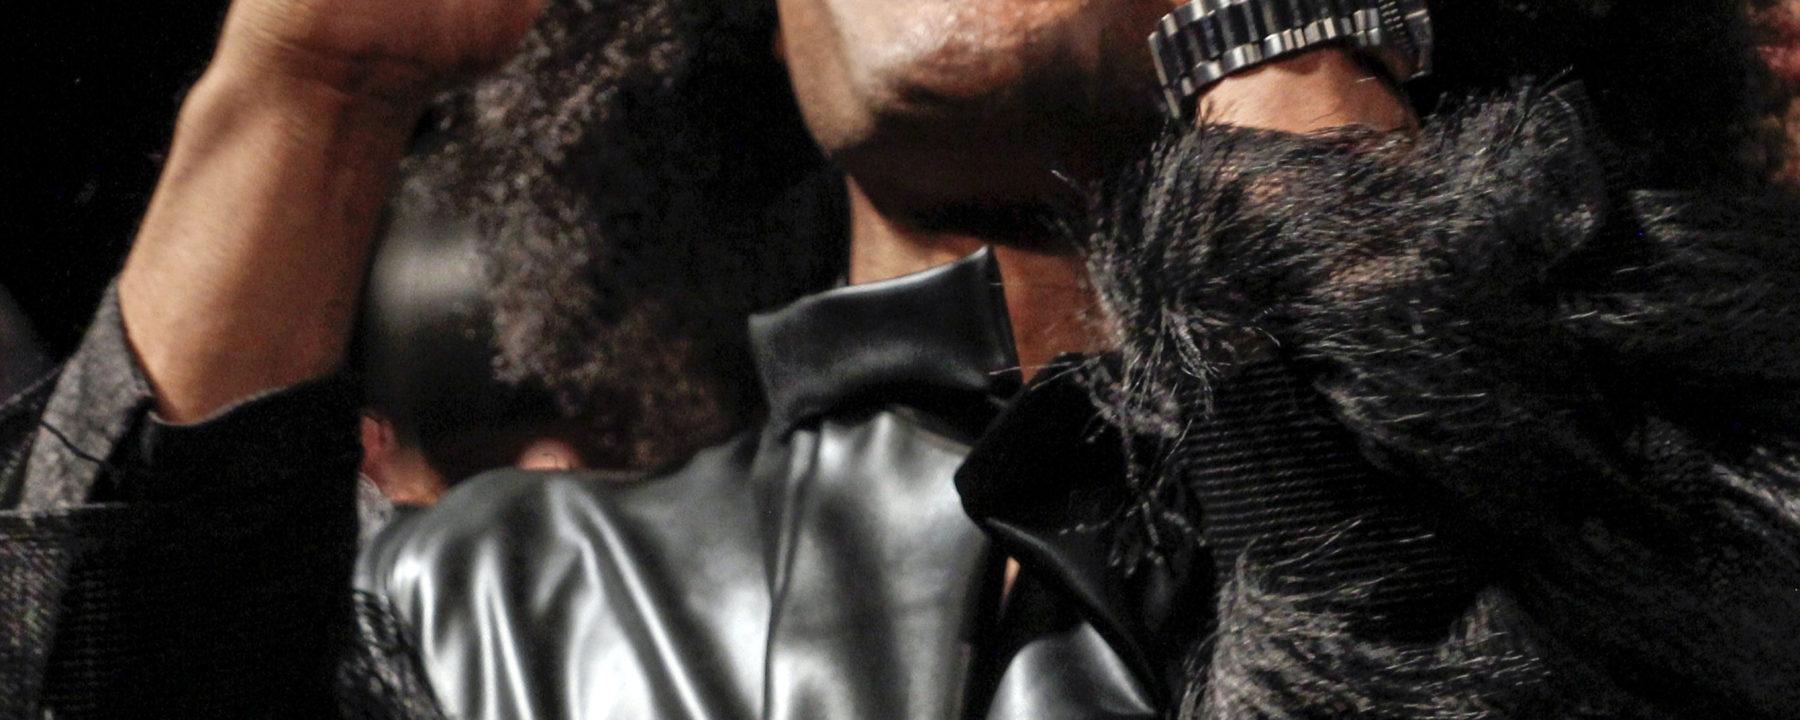 Odair Pereira Dair Fashion Art Hearts Fashion 4Chion Lifestyle